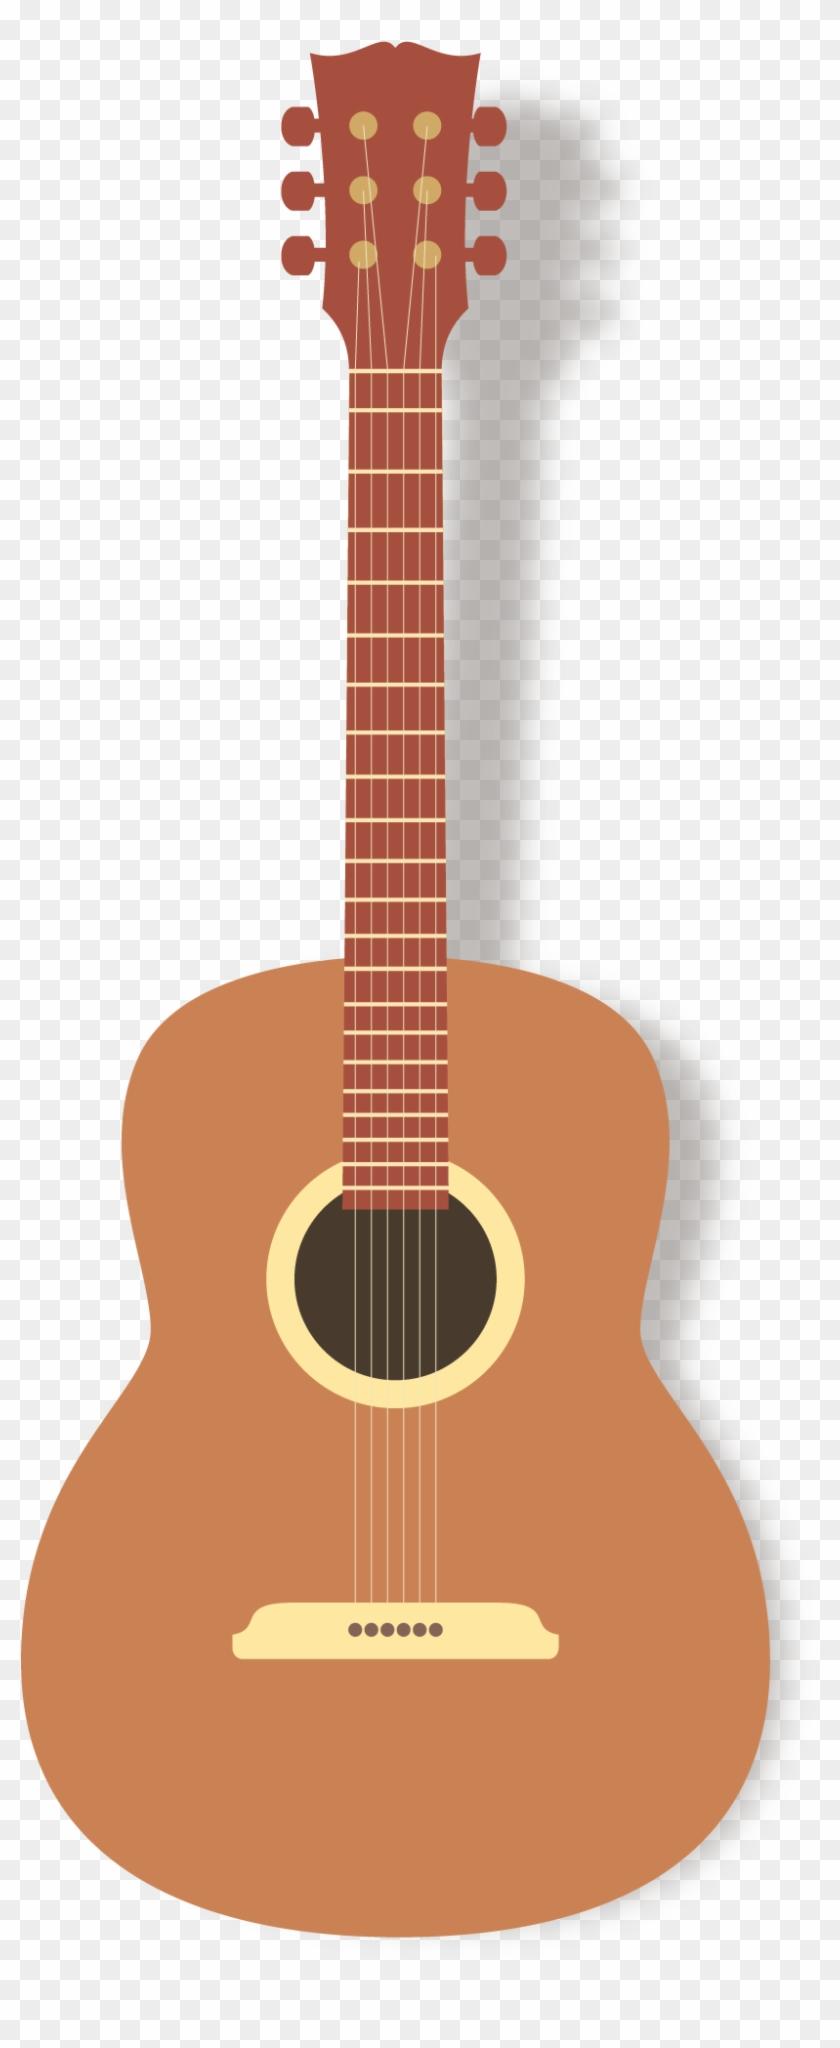 Guitar Clipart Png - Acoustic Guitar Vector Png Transparent Png #3084503